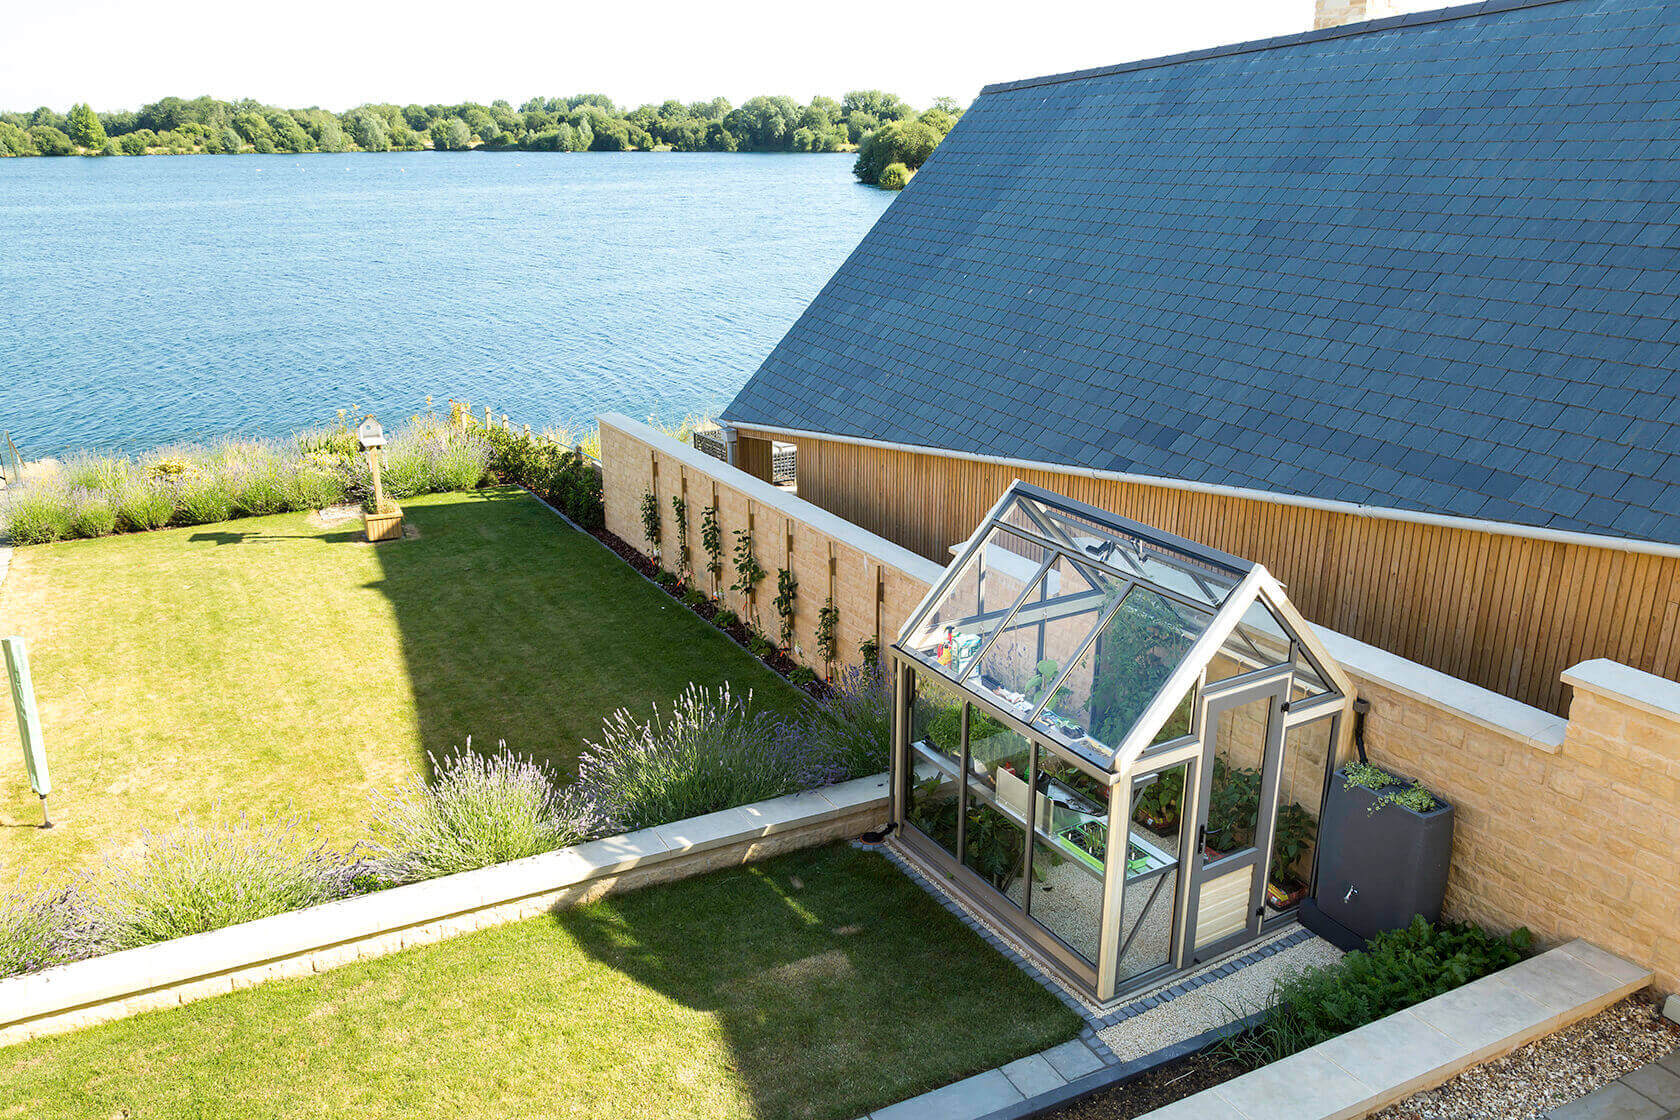 A Greenhouse for a Terrace Garden